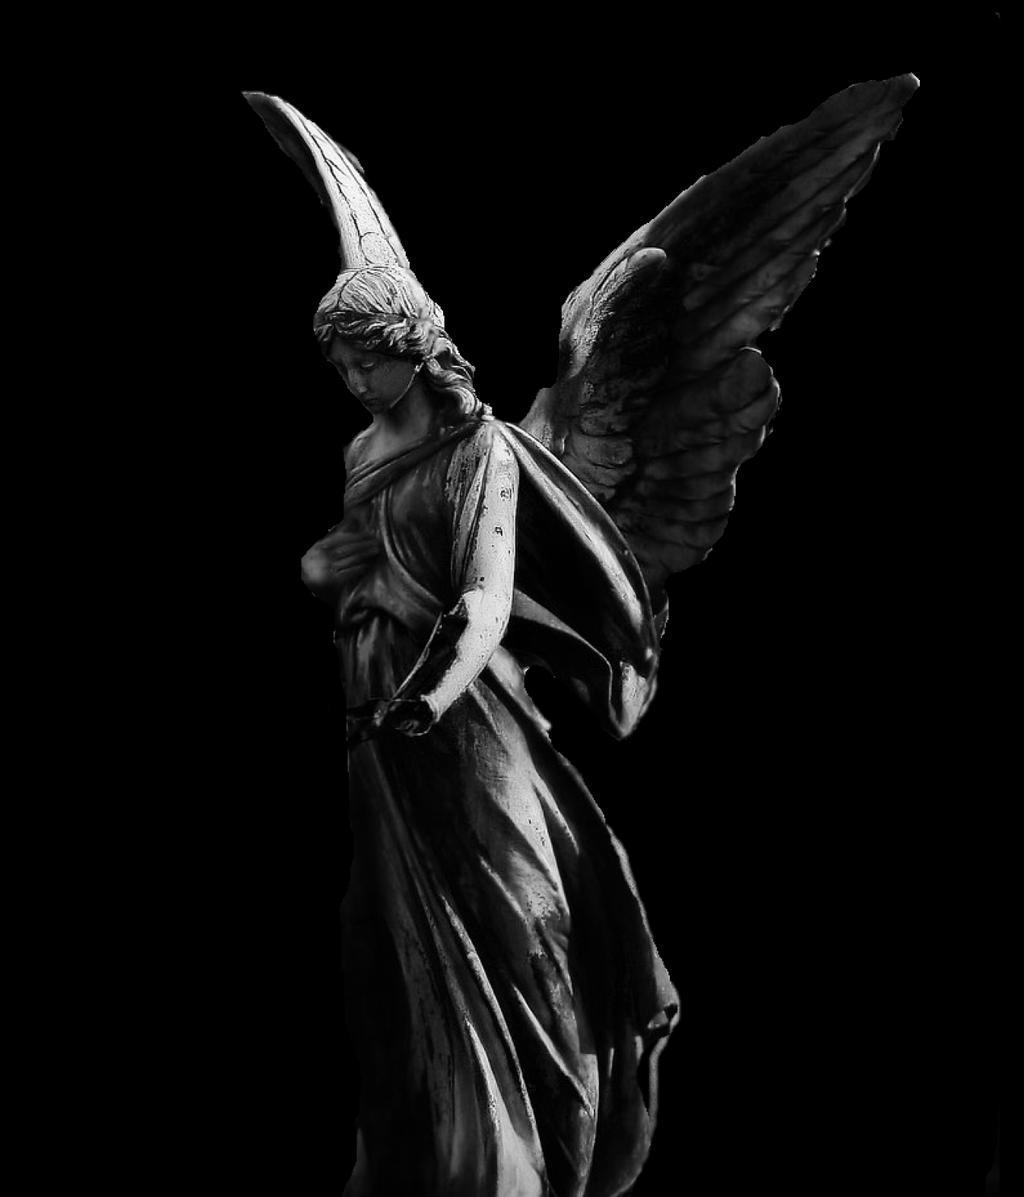 Sad angel stock by ashensorrow on deviantart - Sad angel wallpaper ...